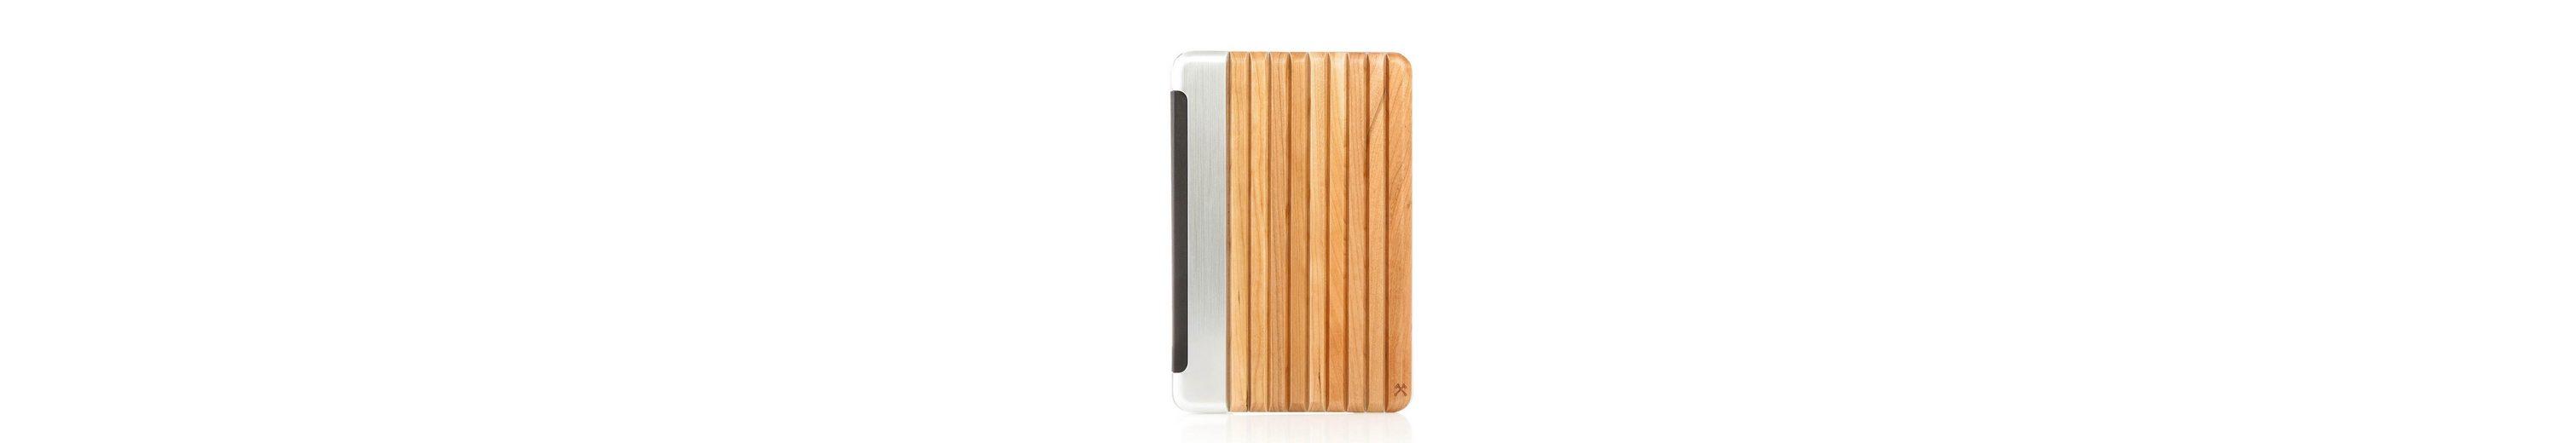 Woodcessories EcoGuard - Echtholz Case für iPad Mini 4 - Hooks